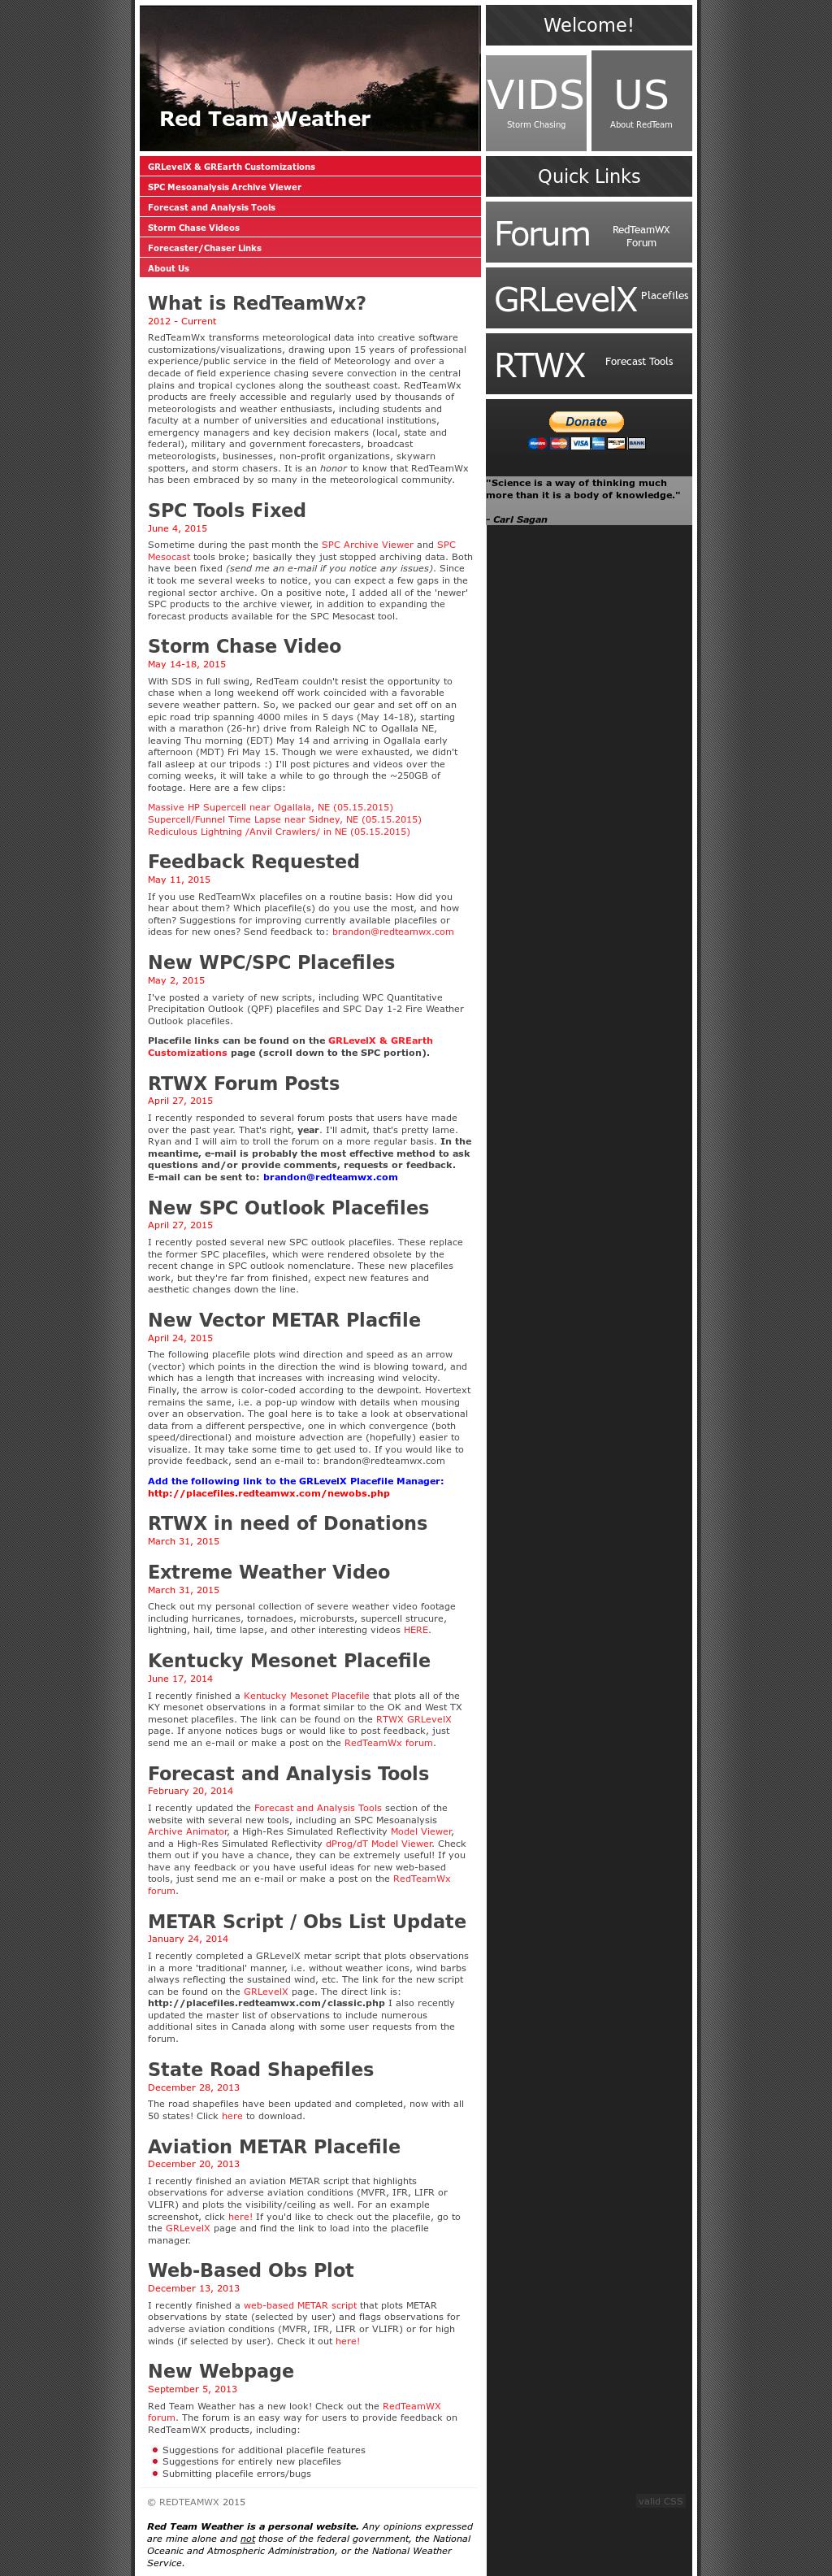 Redteamwx Competitors, Revenue and Employees - Owler Company Profile